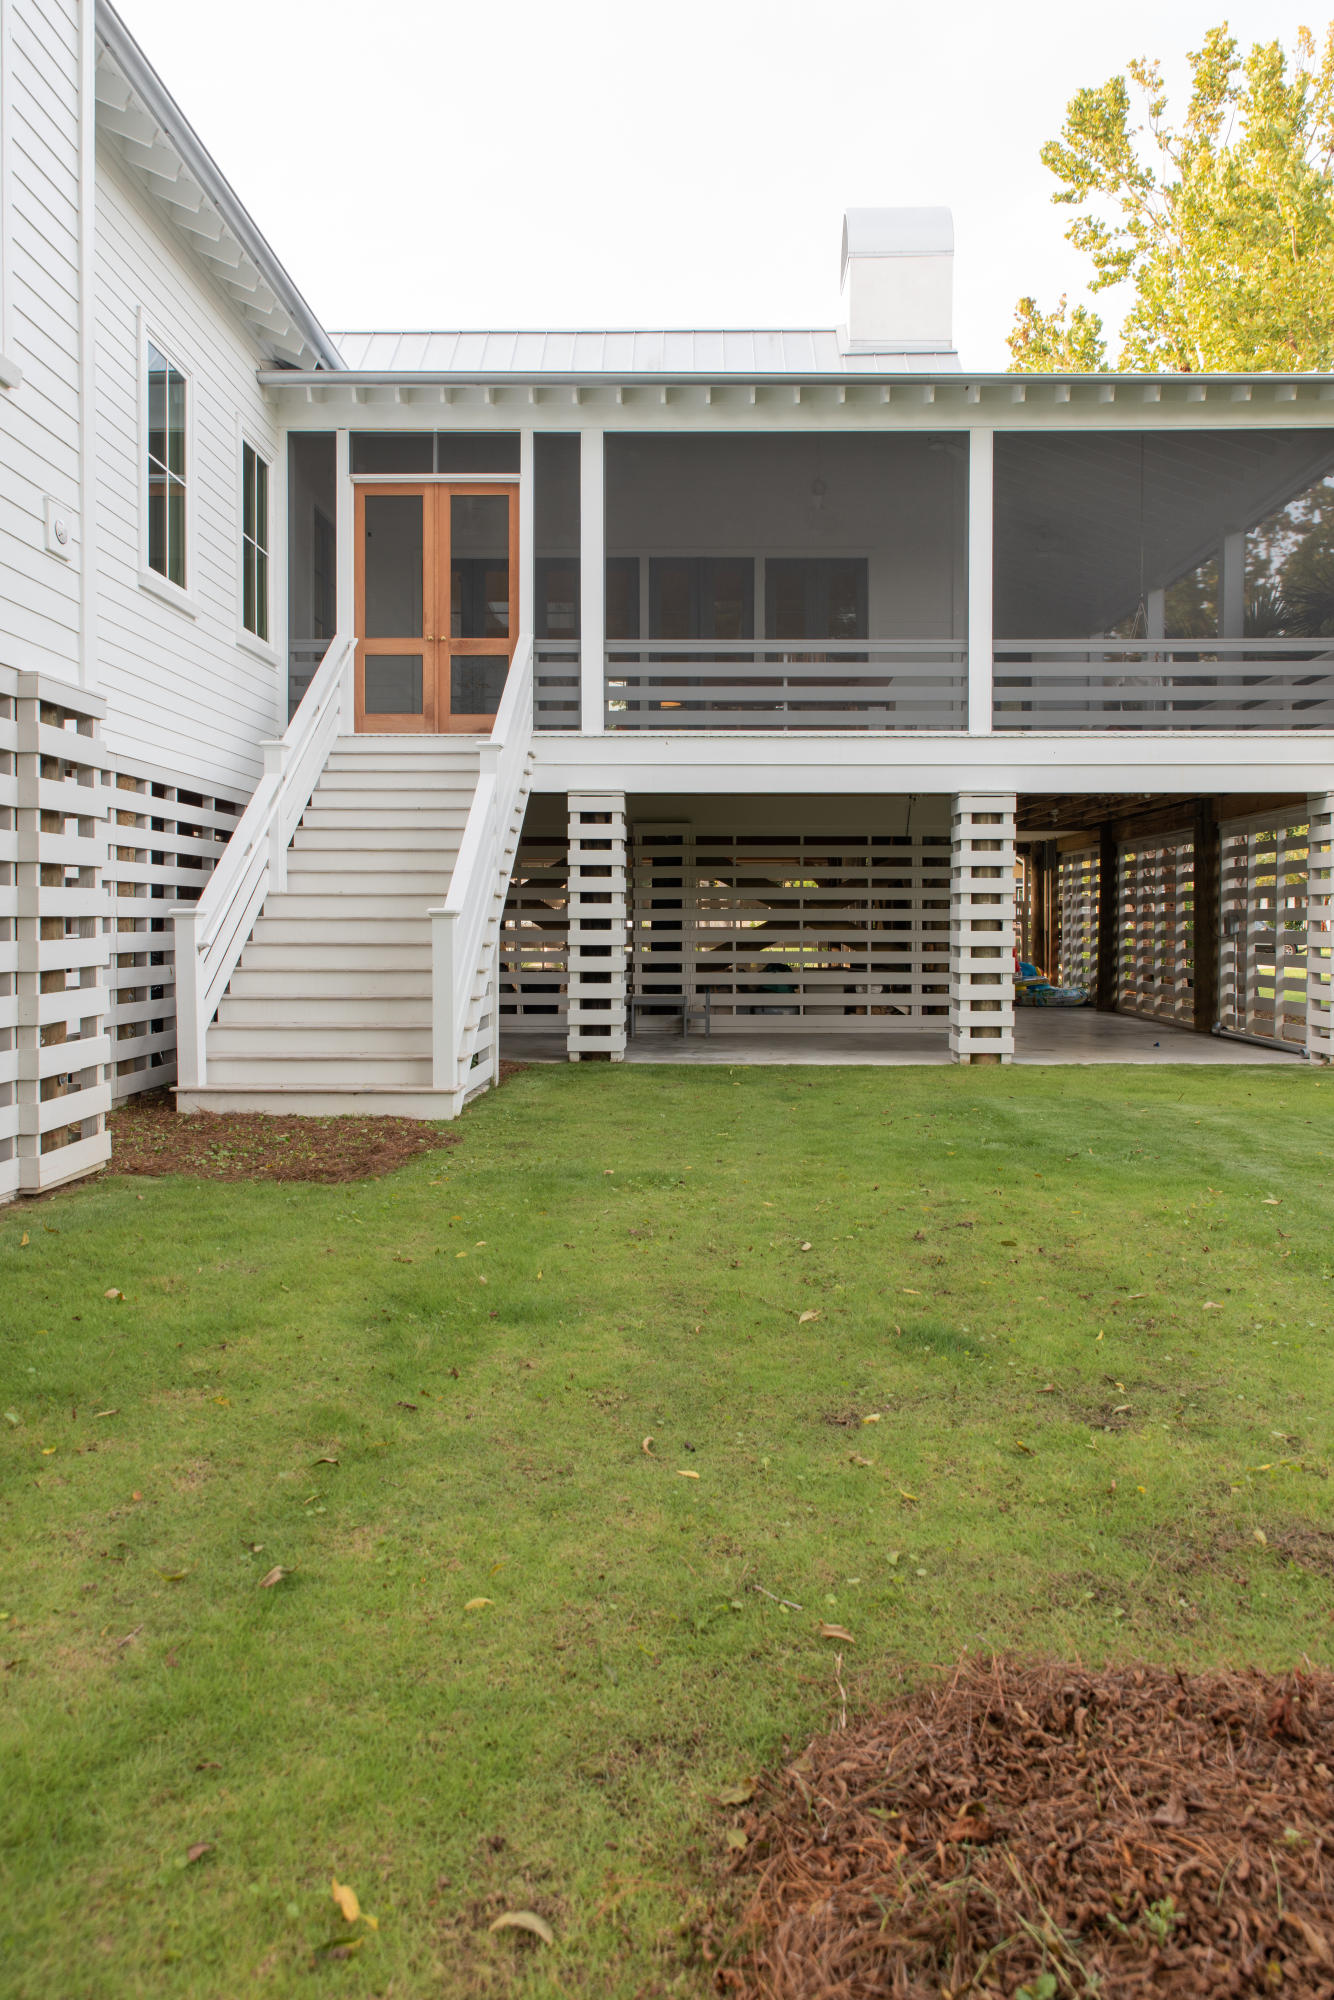 Scanlonville Homes For Sale - 181 5th, Mount Pleasant, SC - 33